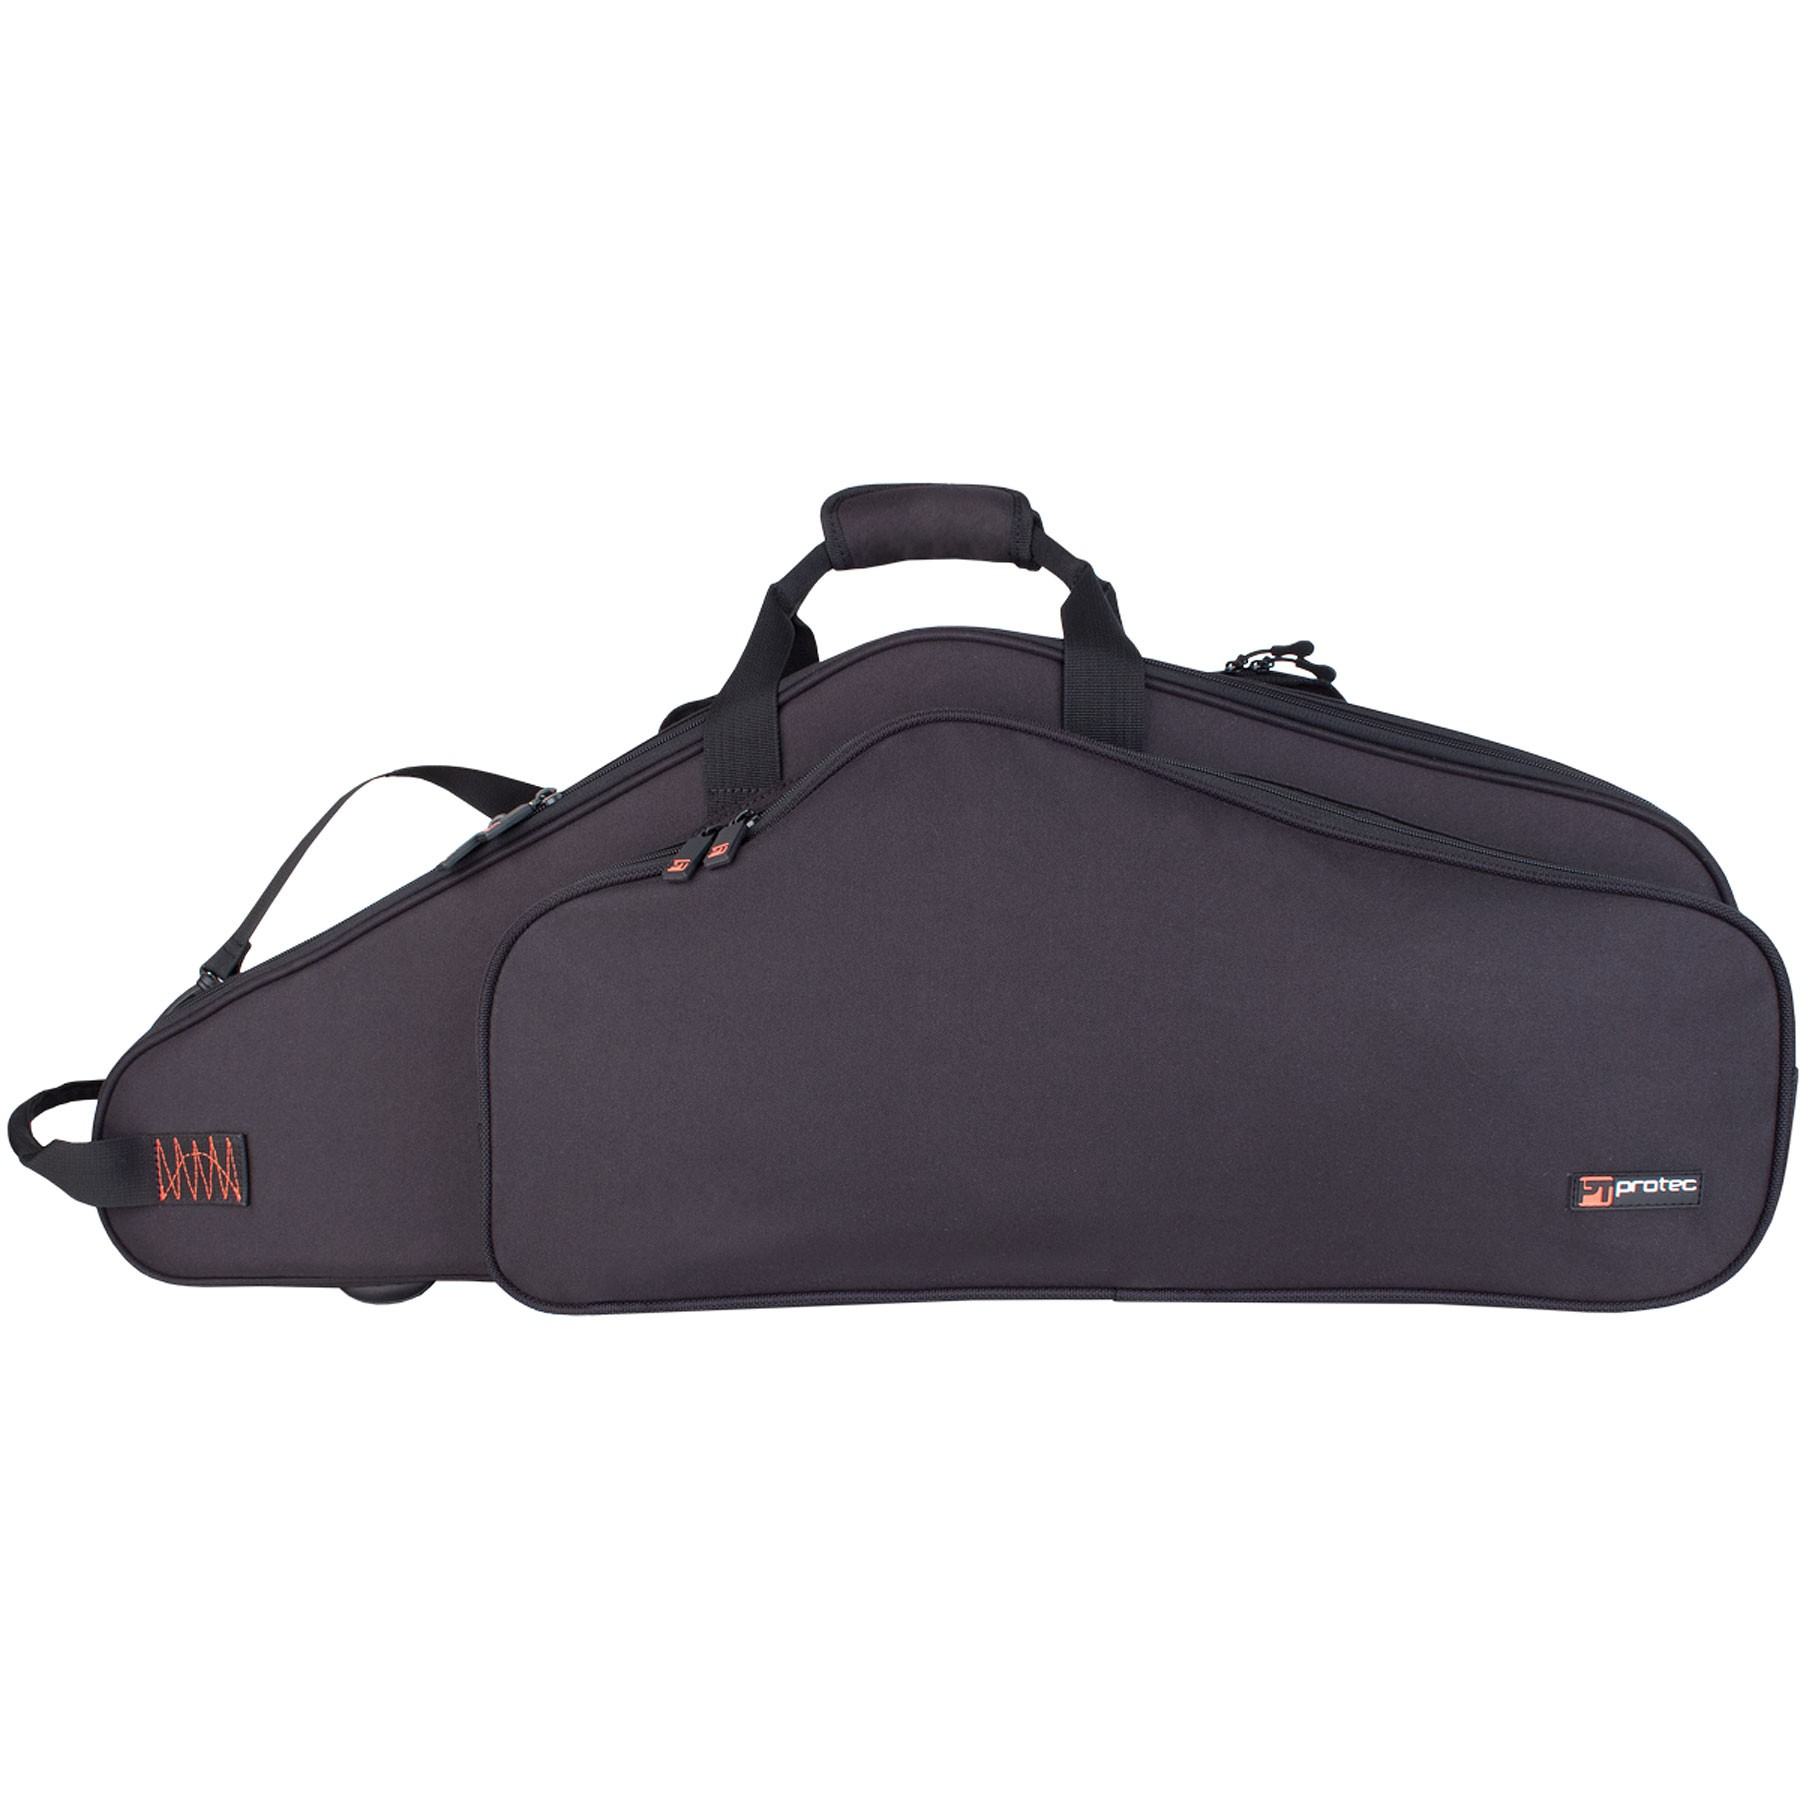 Protec Tenor Saxophone Explorer Gig Bag with Sheet Music Pocket (C236X)